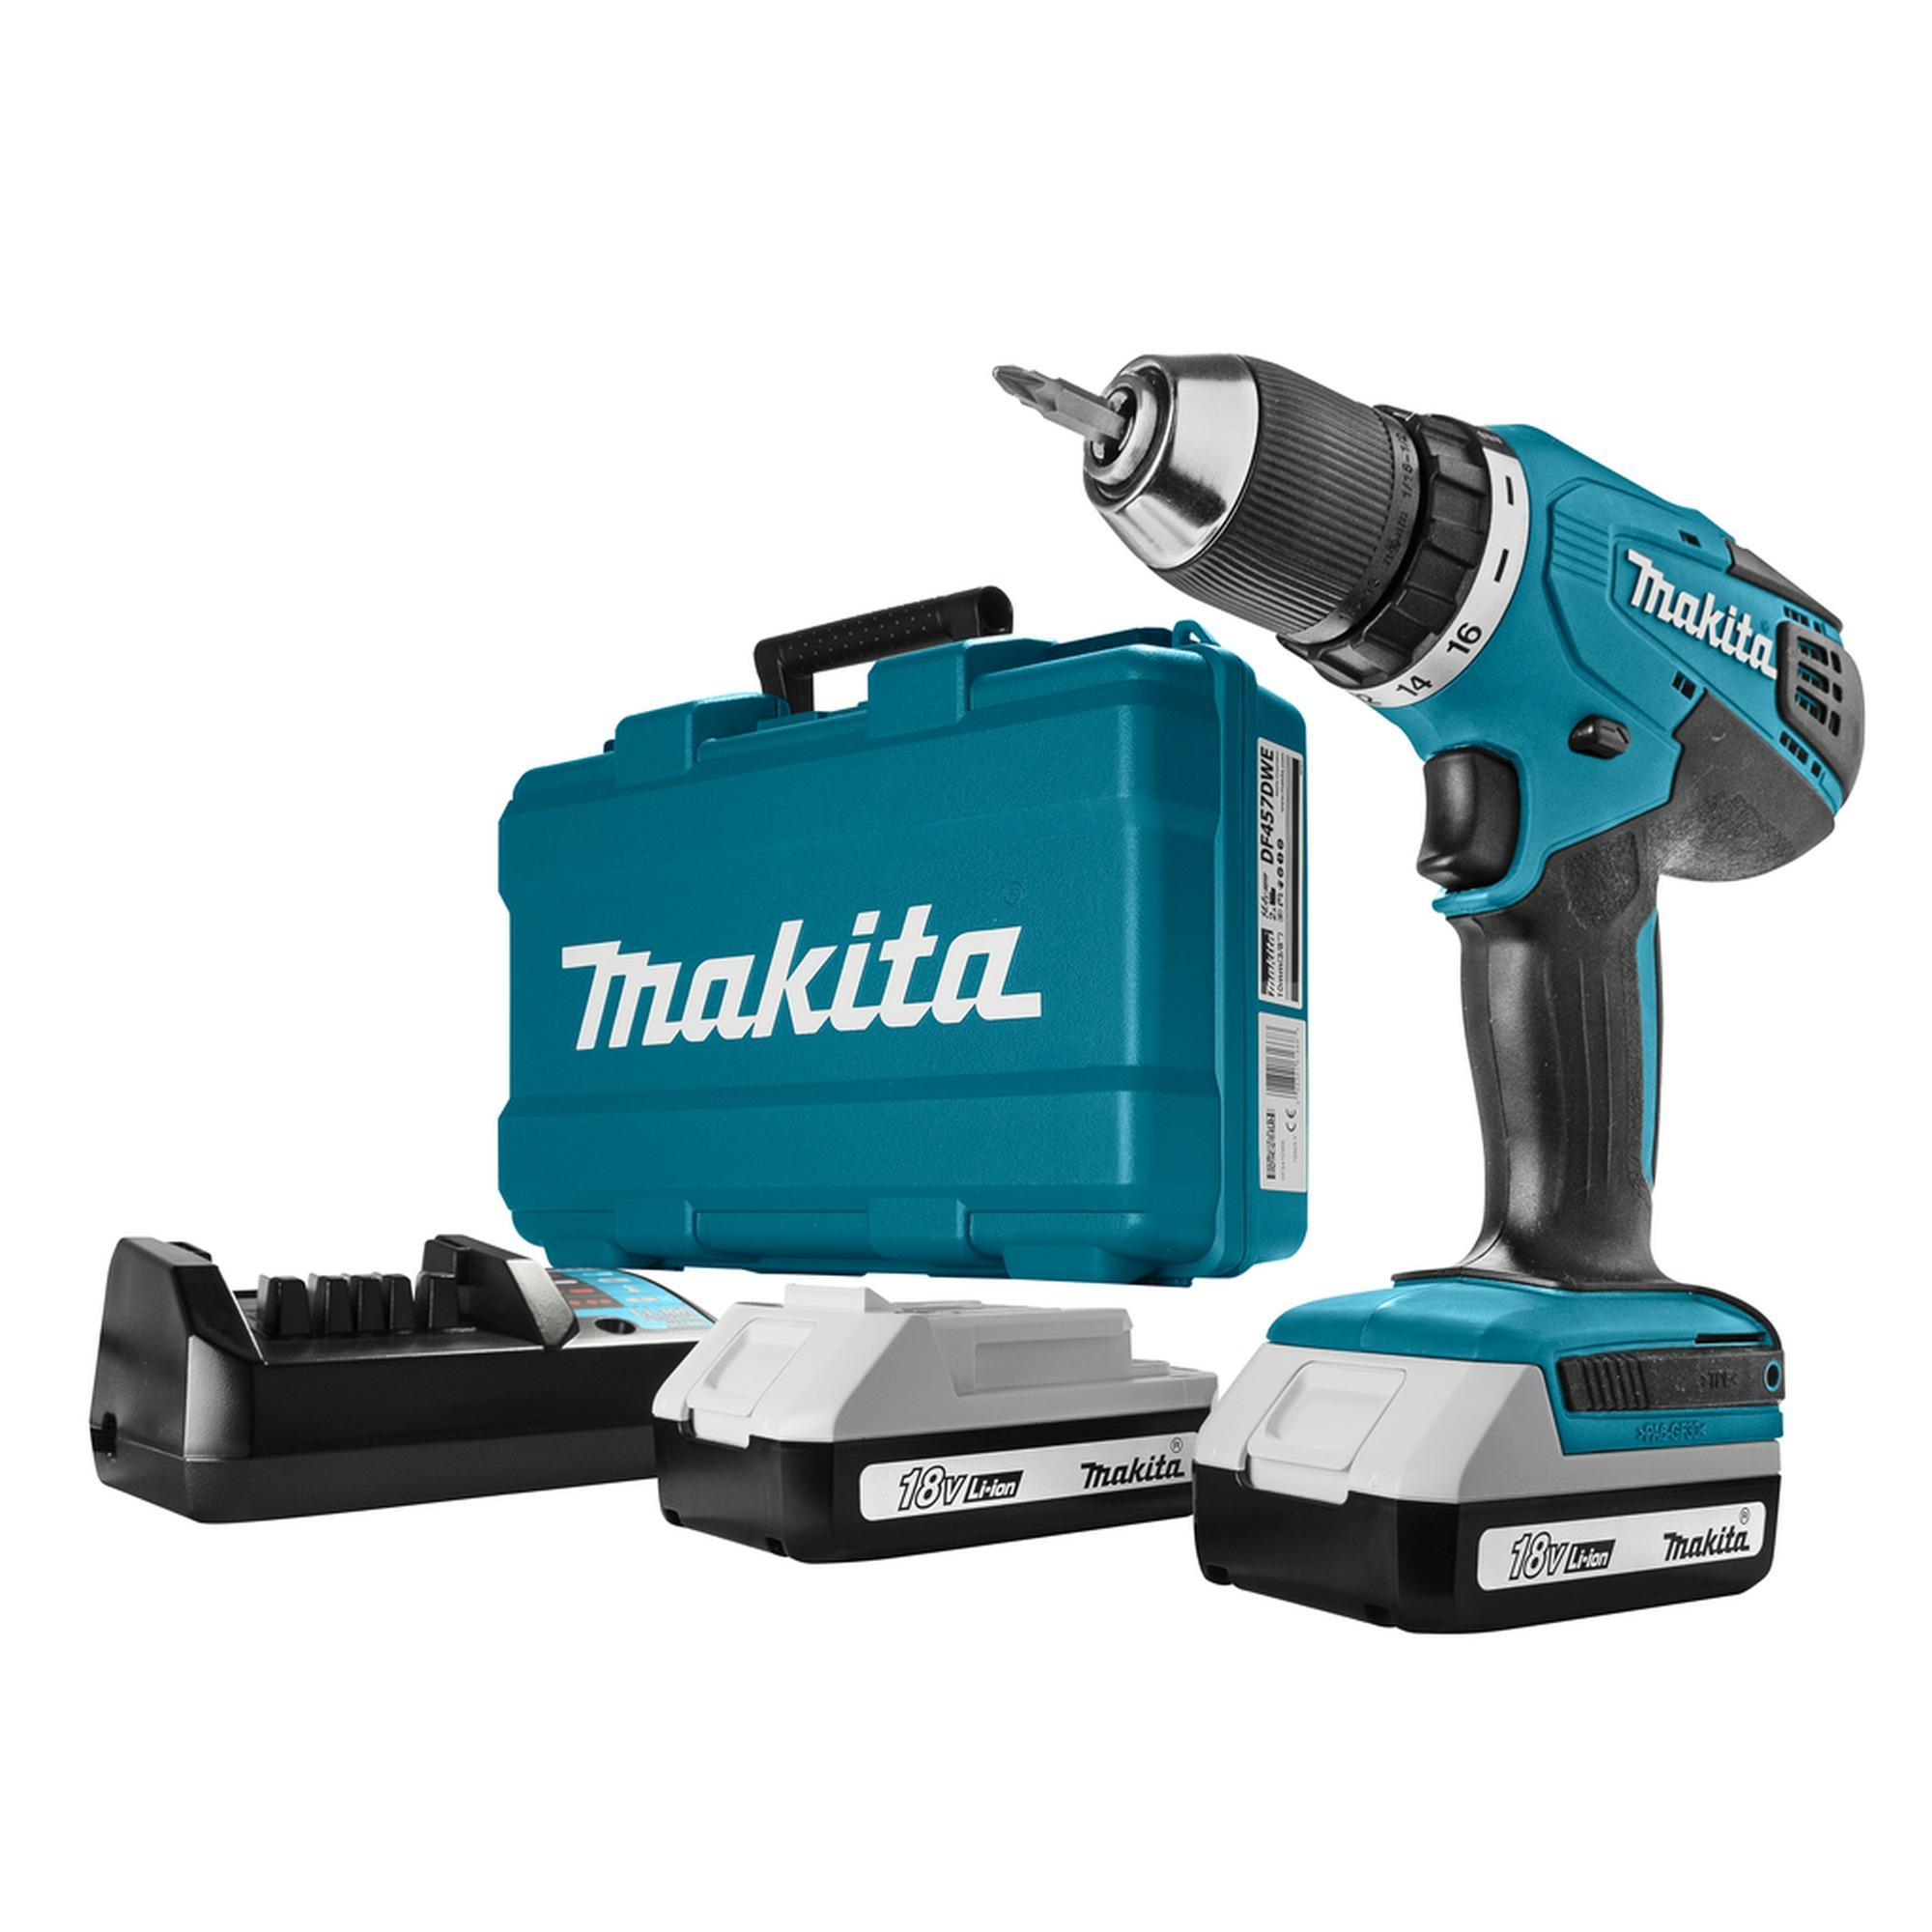 Makita accu boormachine DF457DWE